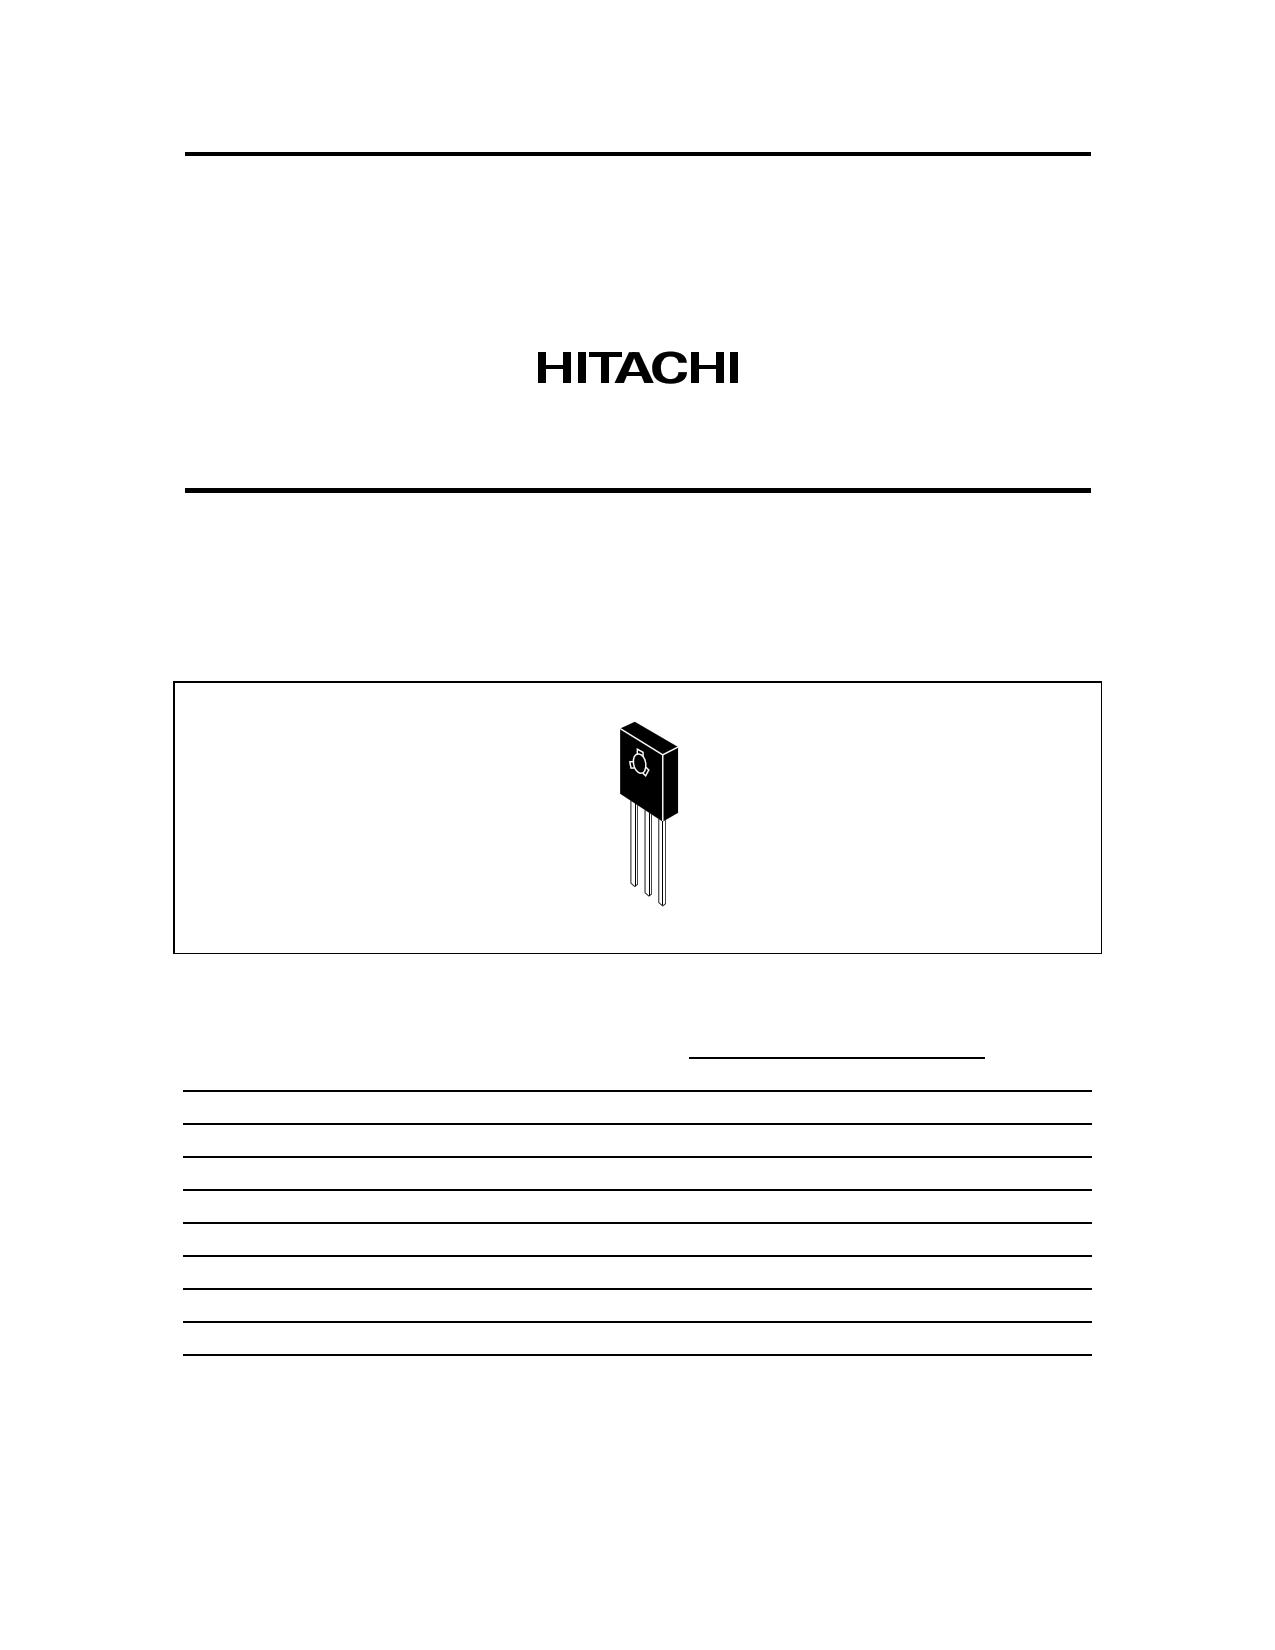 2SB648A datasheet, circuit